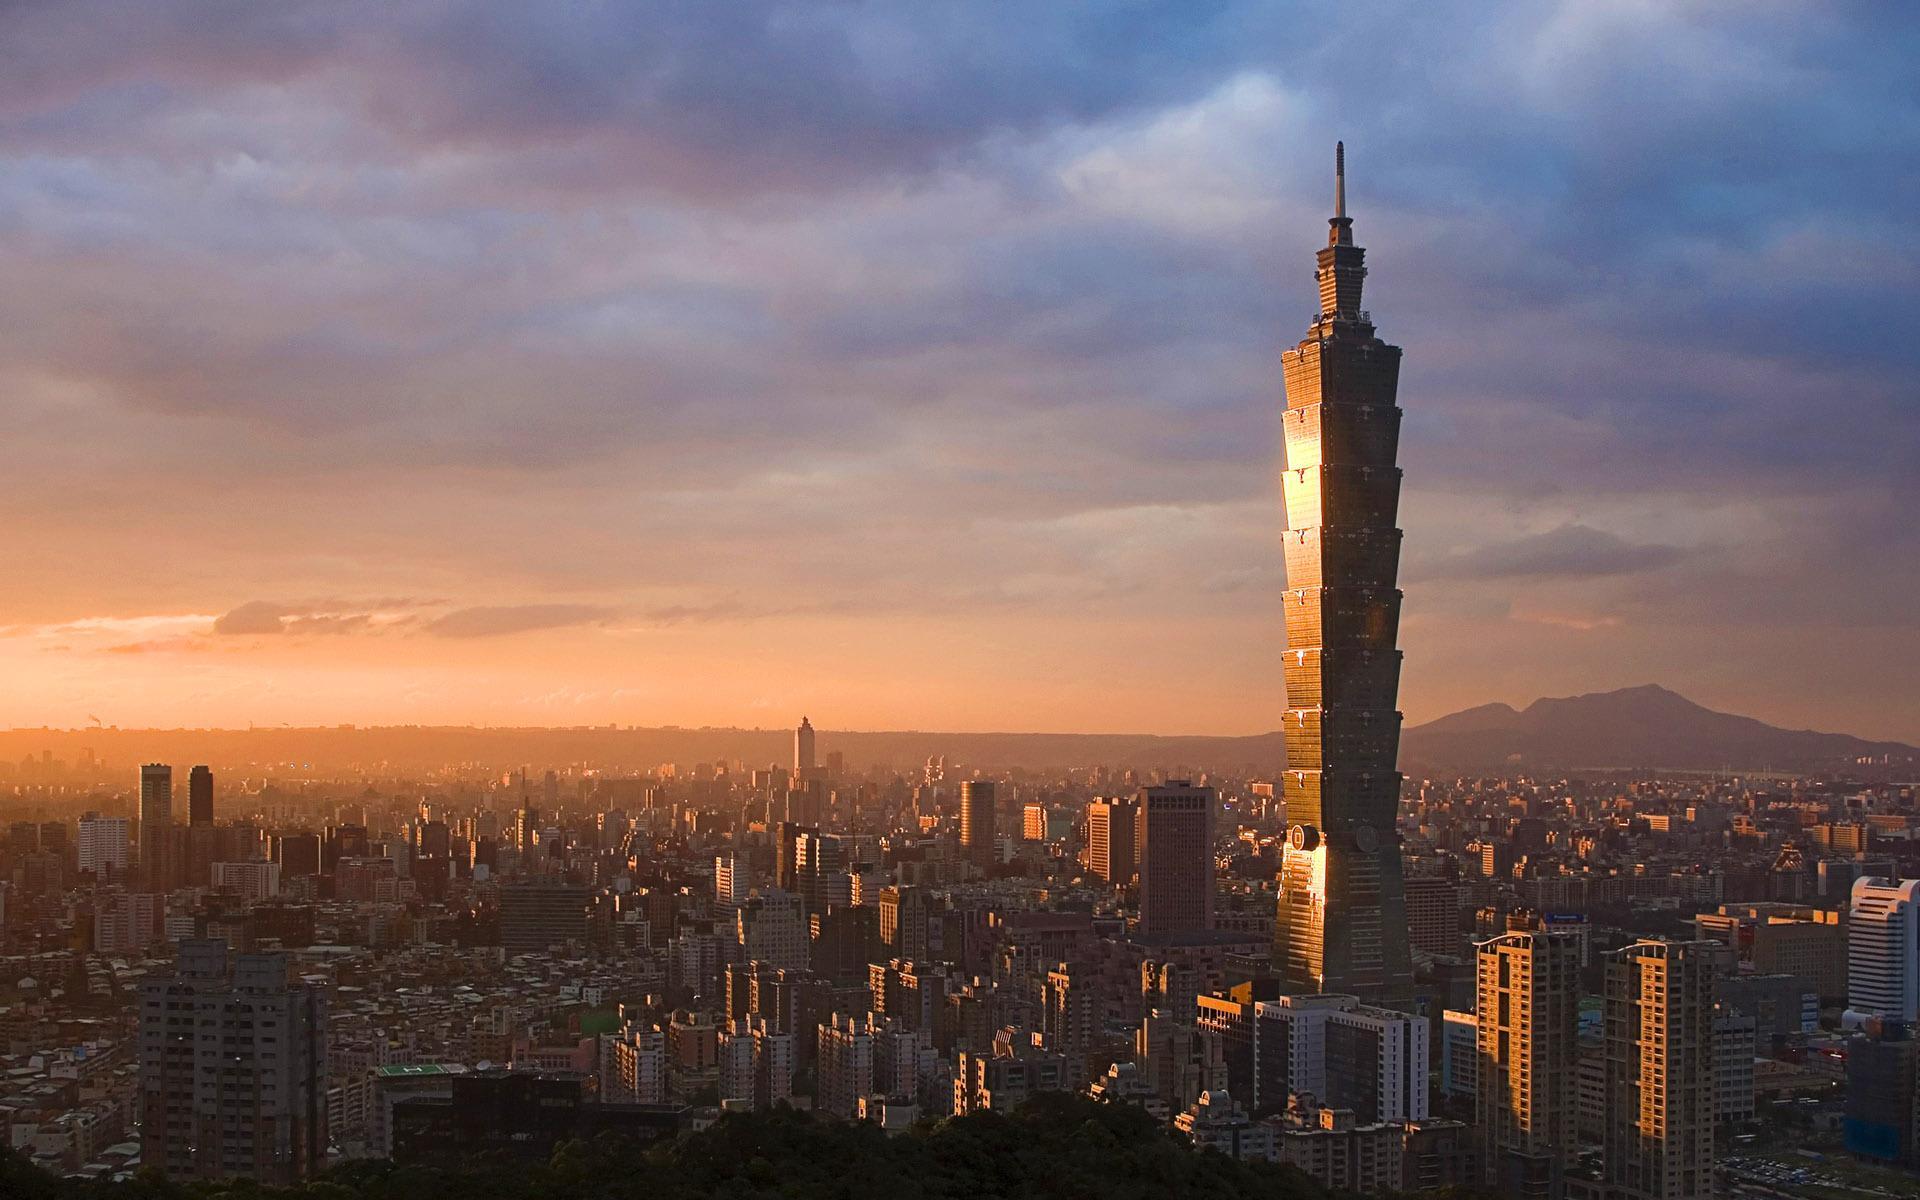 Taiwan Skyline